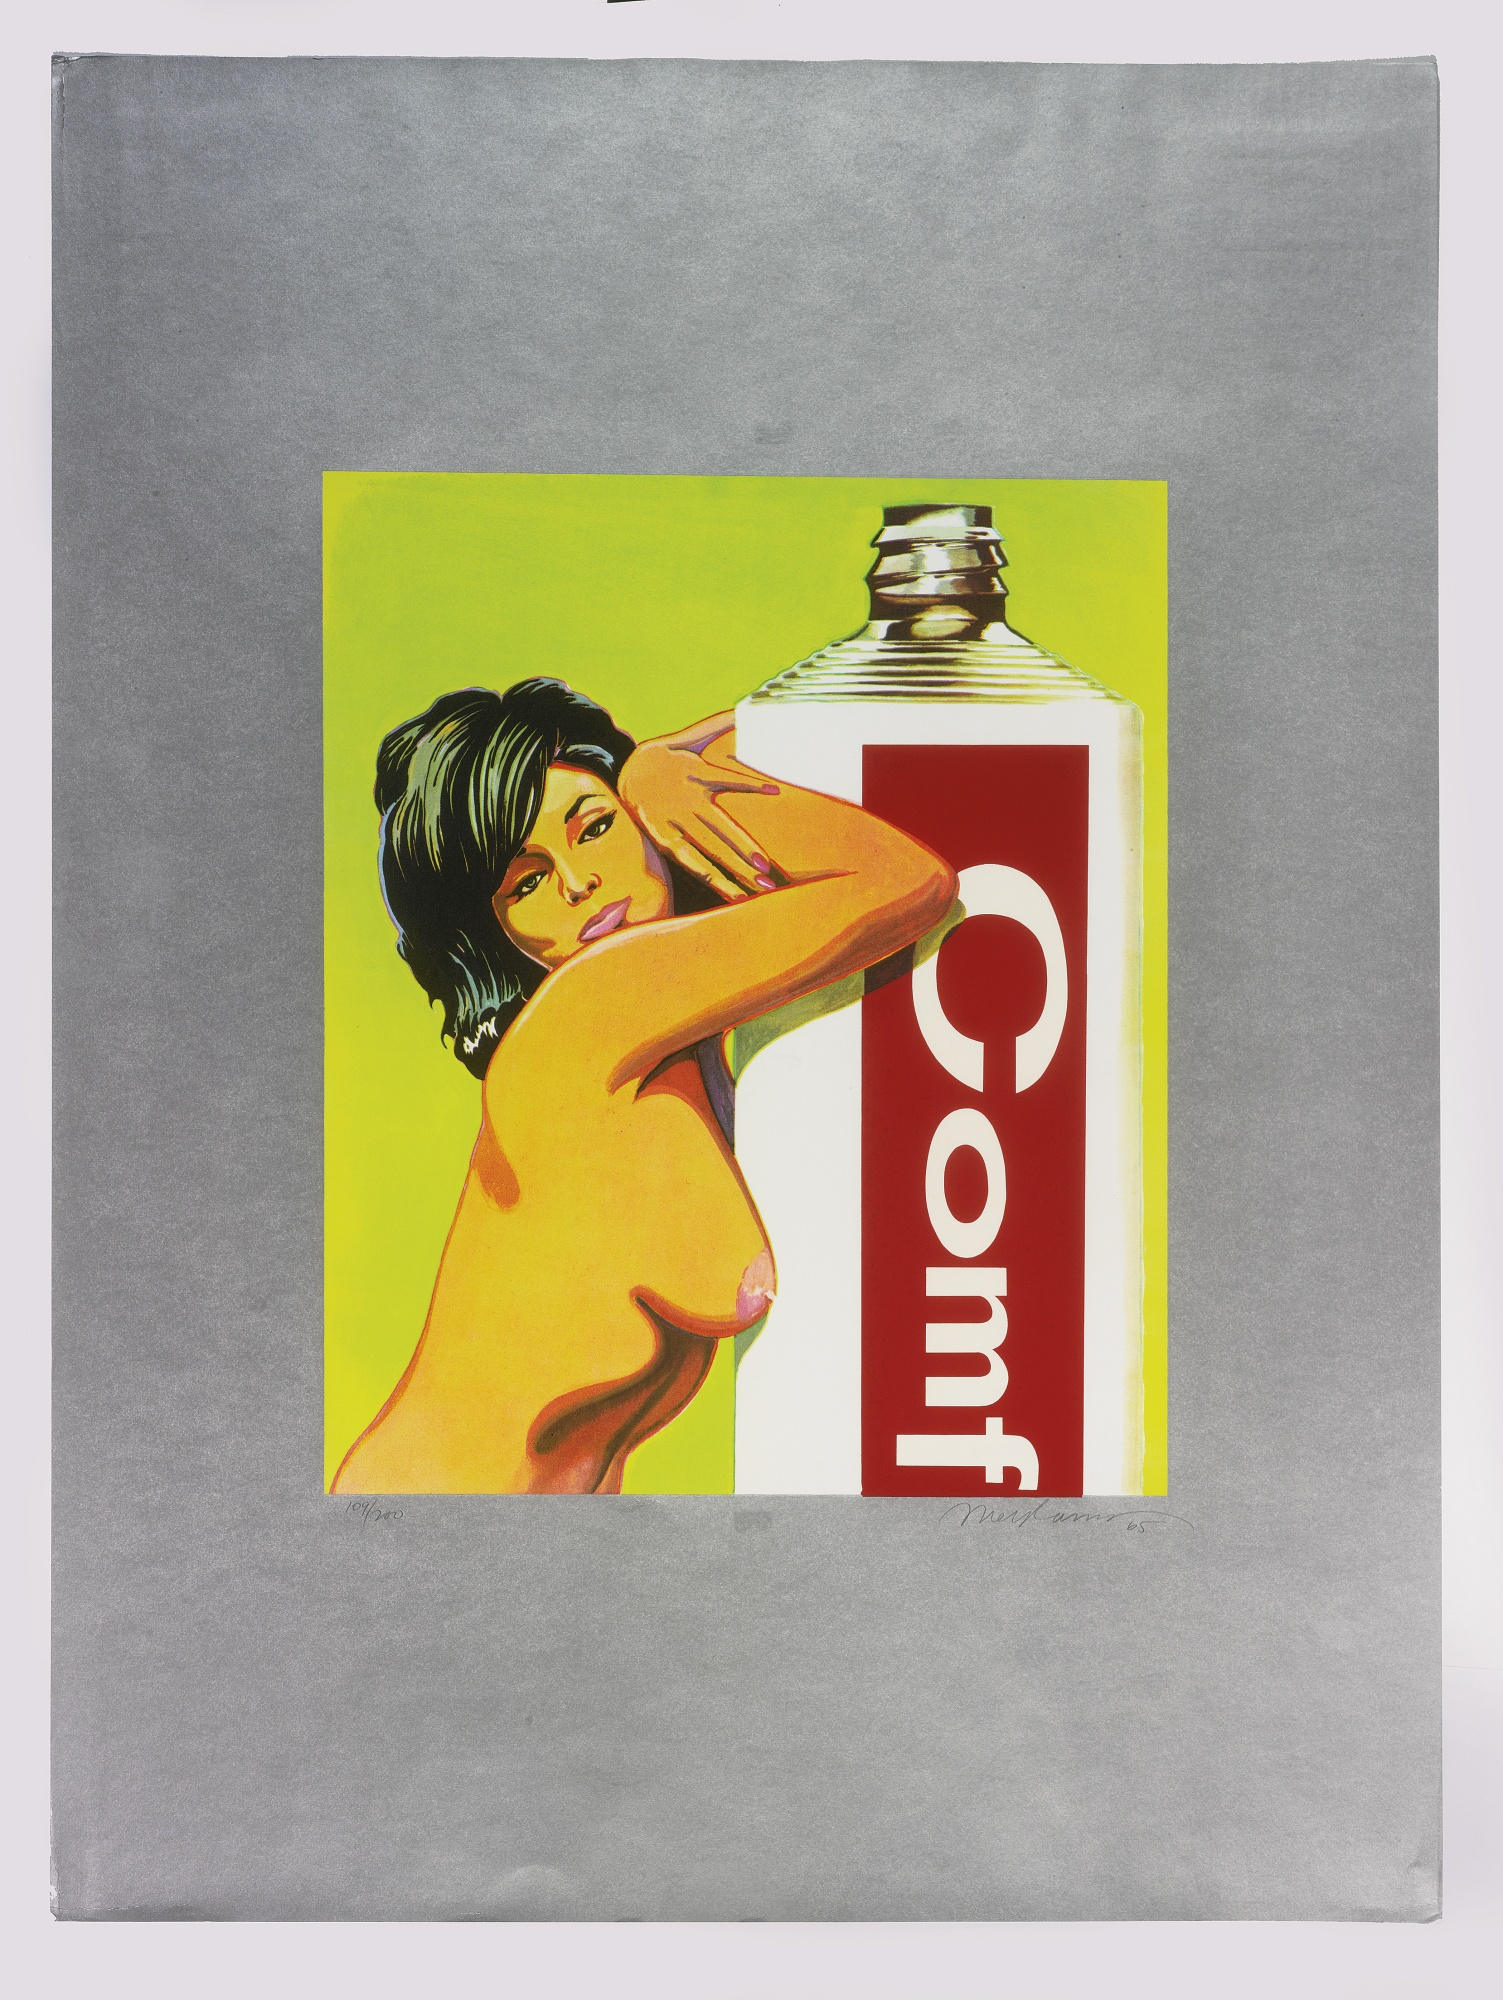 Portfolio - Portfolio - 11 Pop Artists Volume III: 9 Prints-1965